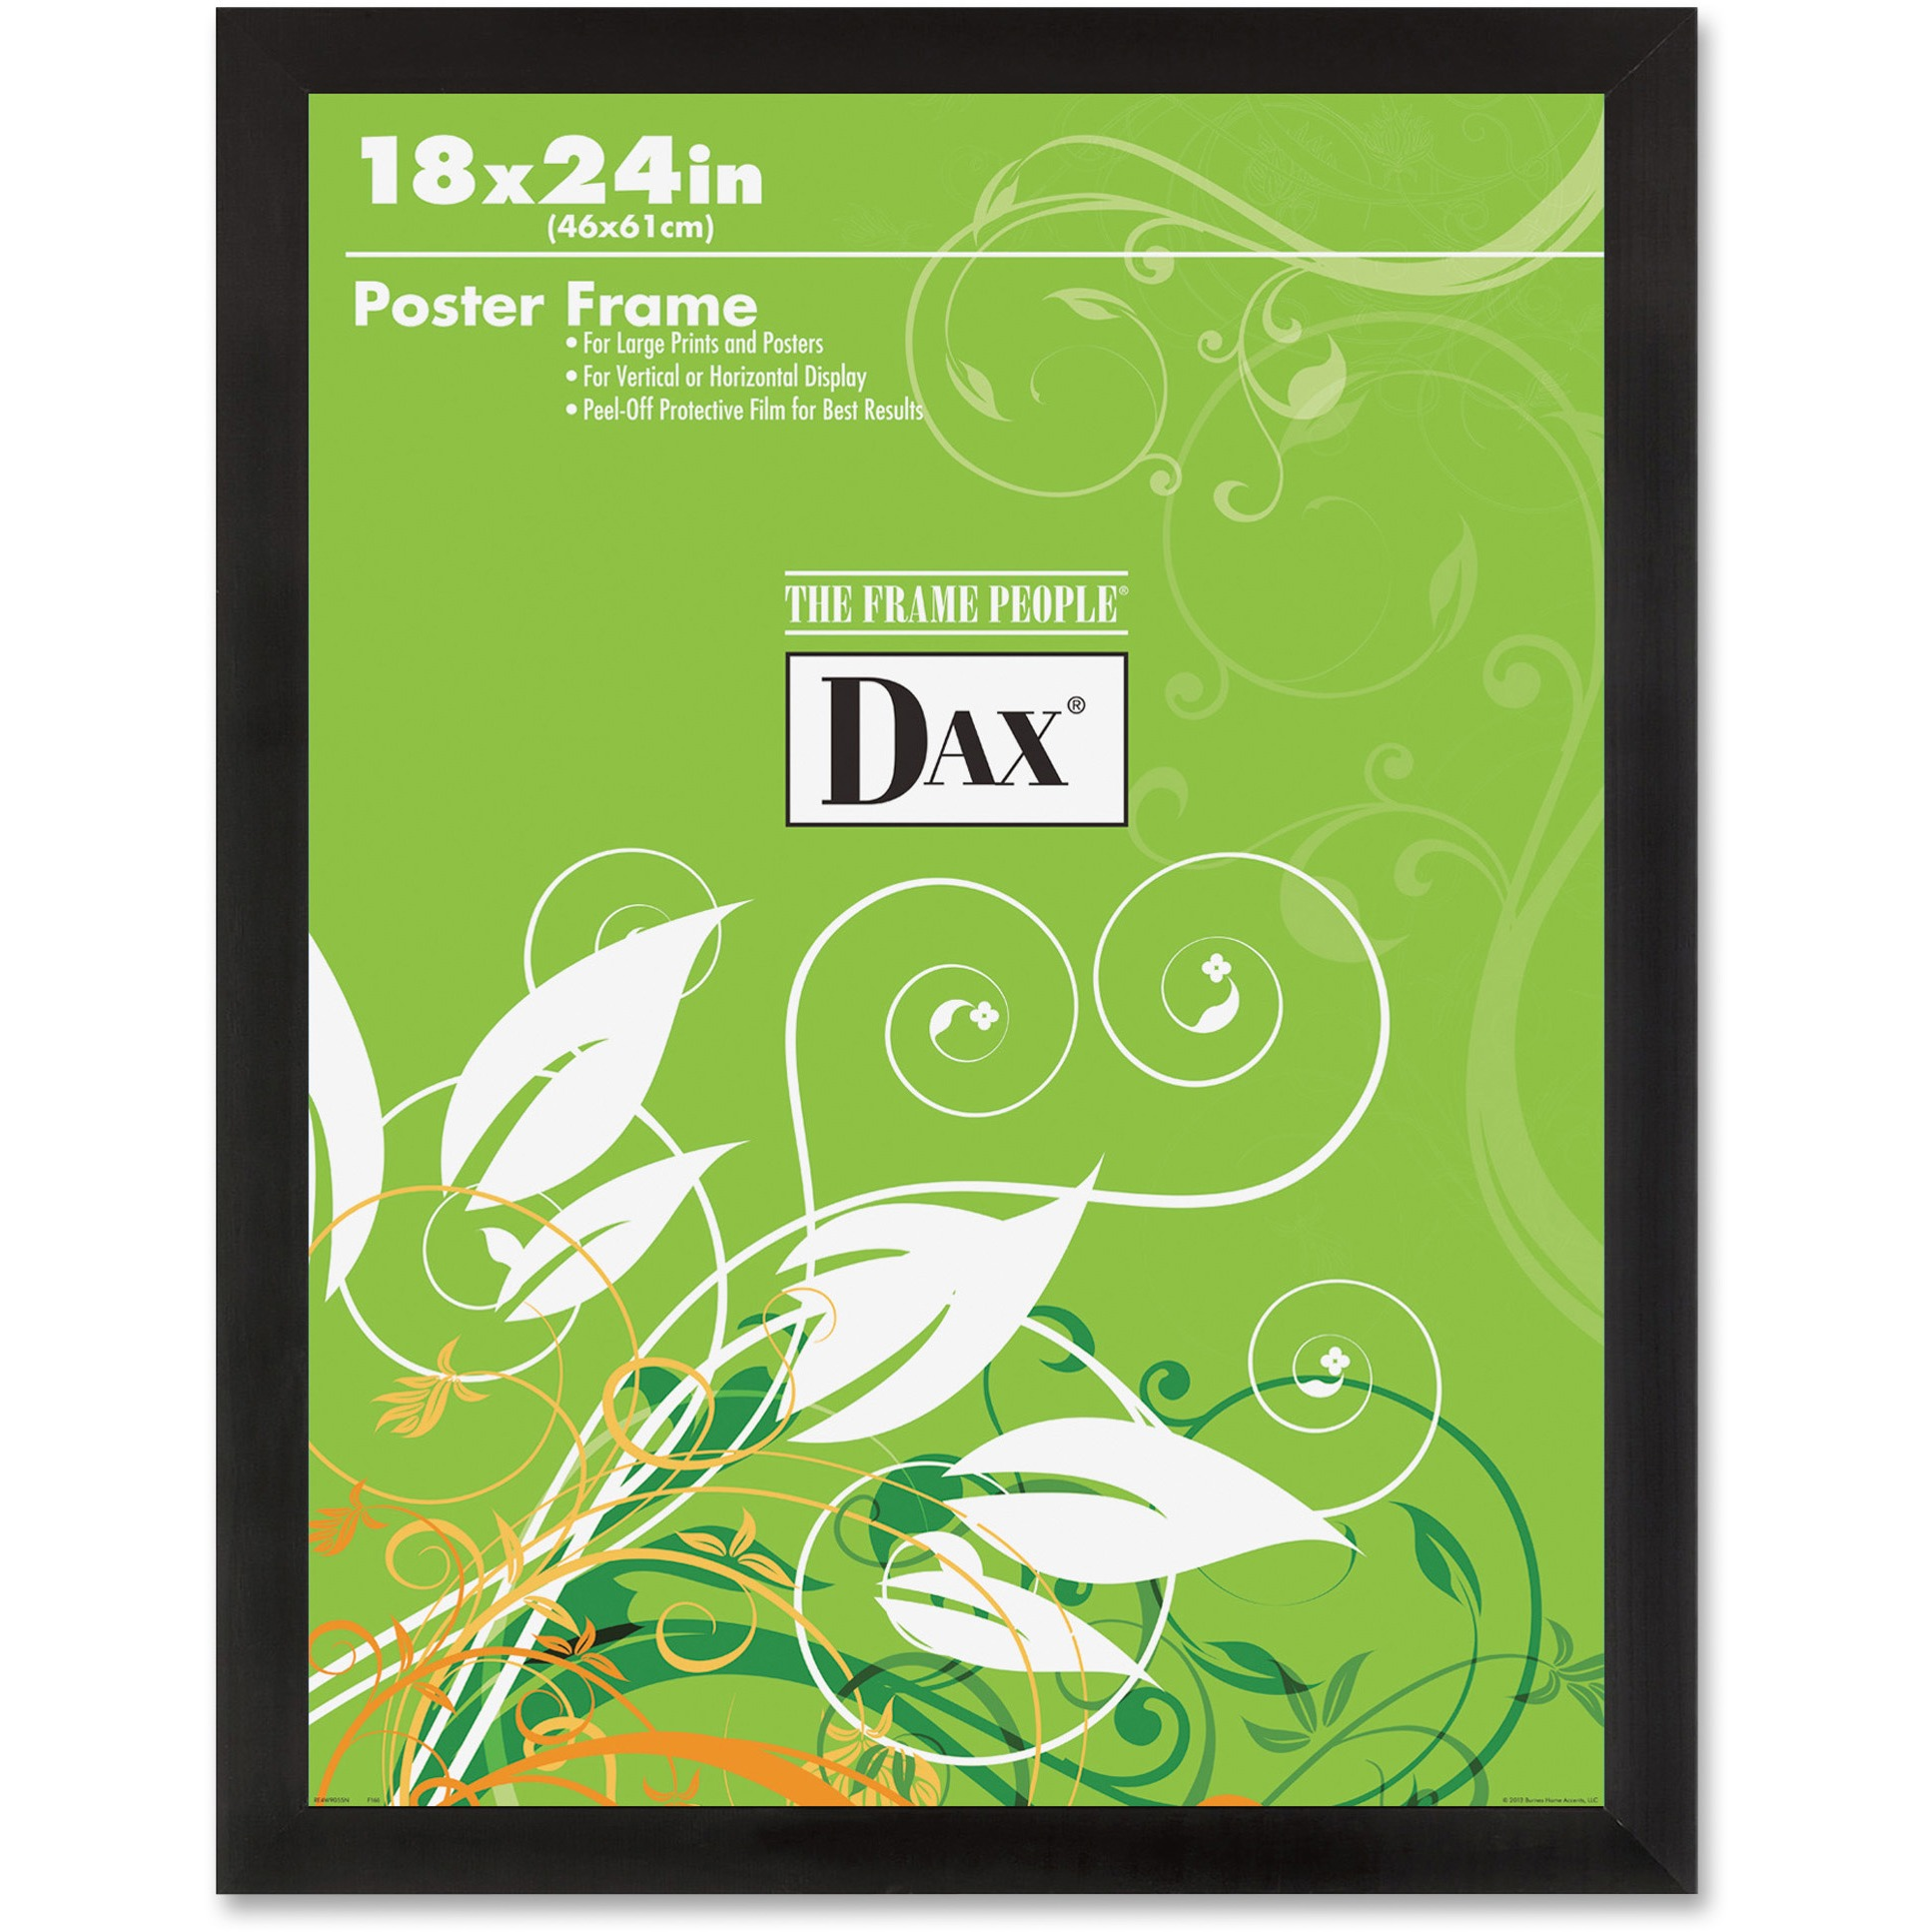 DAX Black Solid Wood Poster Frames w/Plastic Window, Wide Profile, 18 x 24